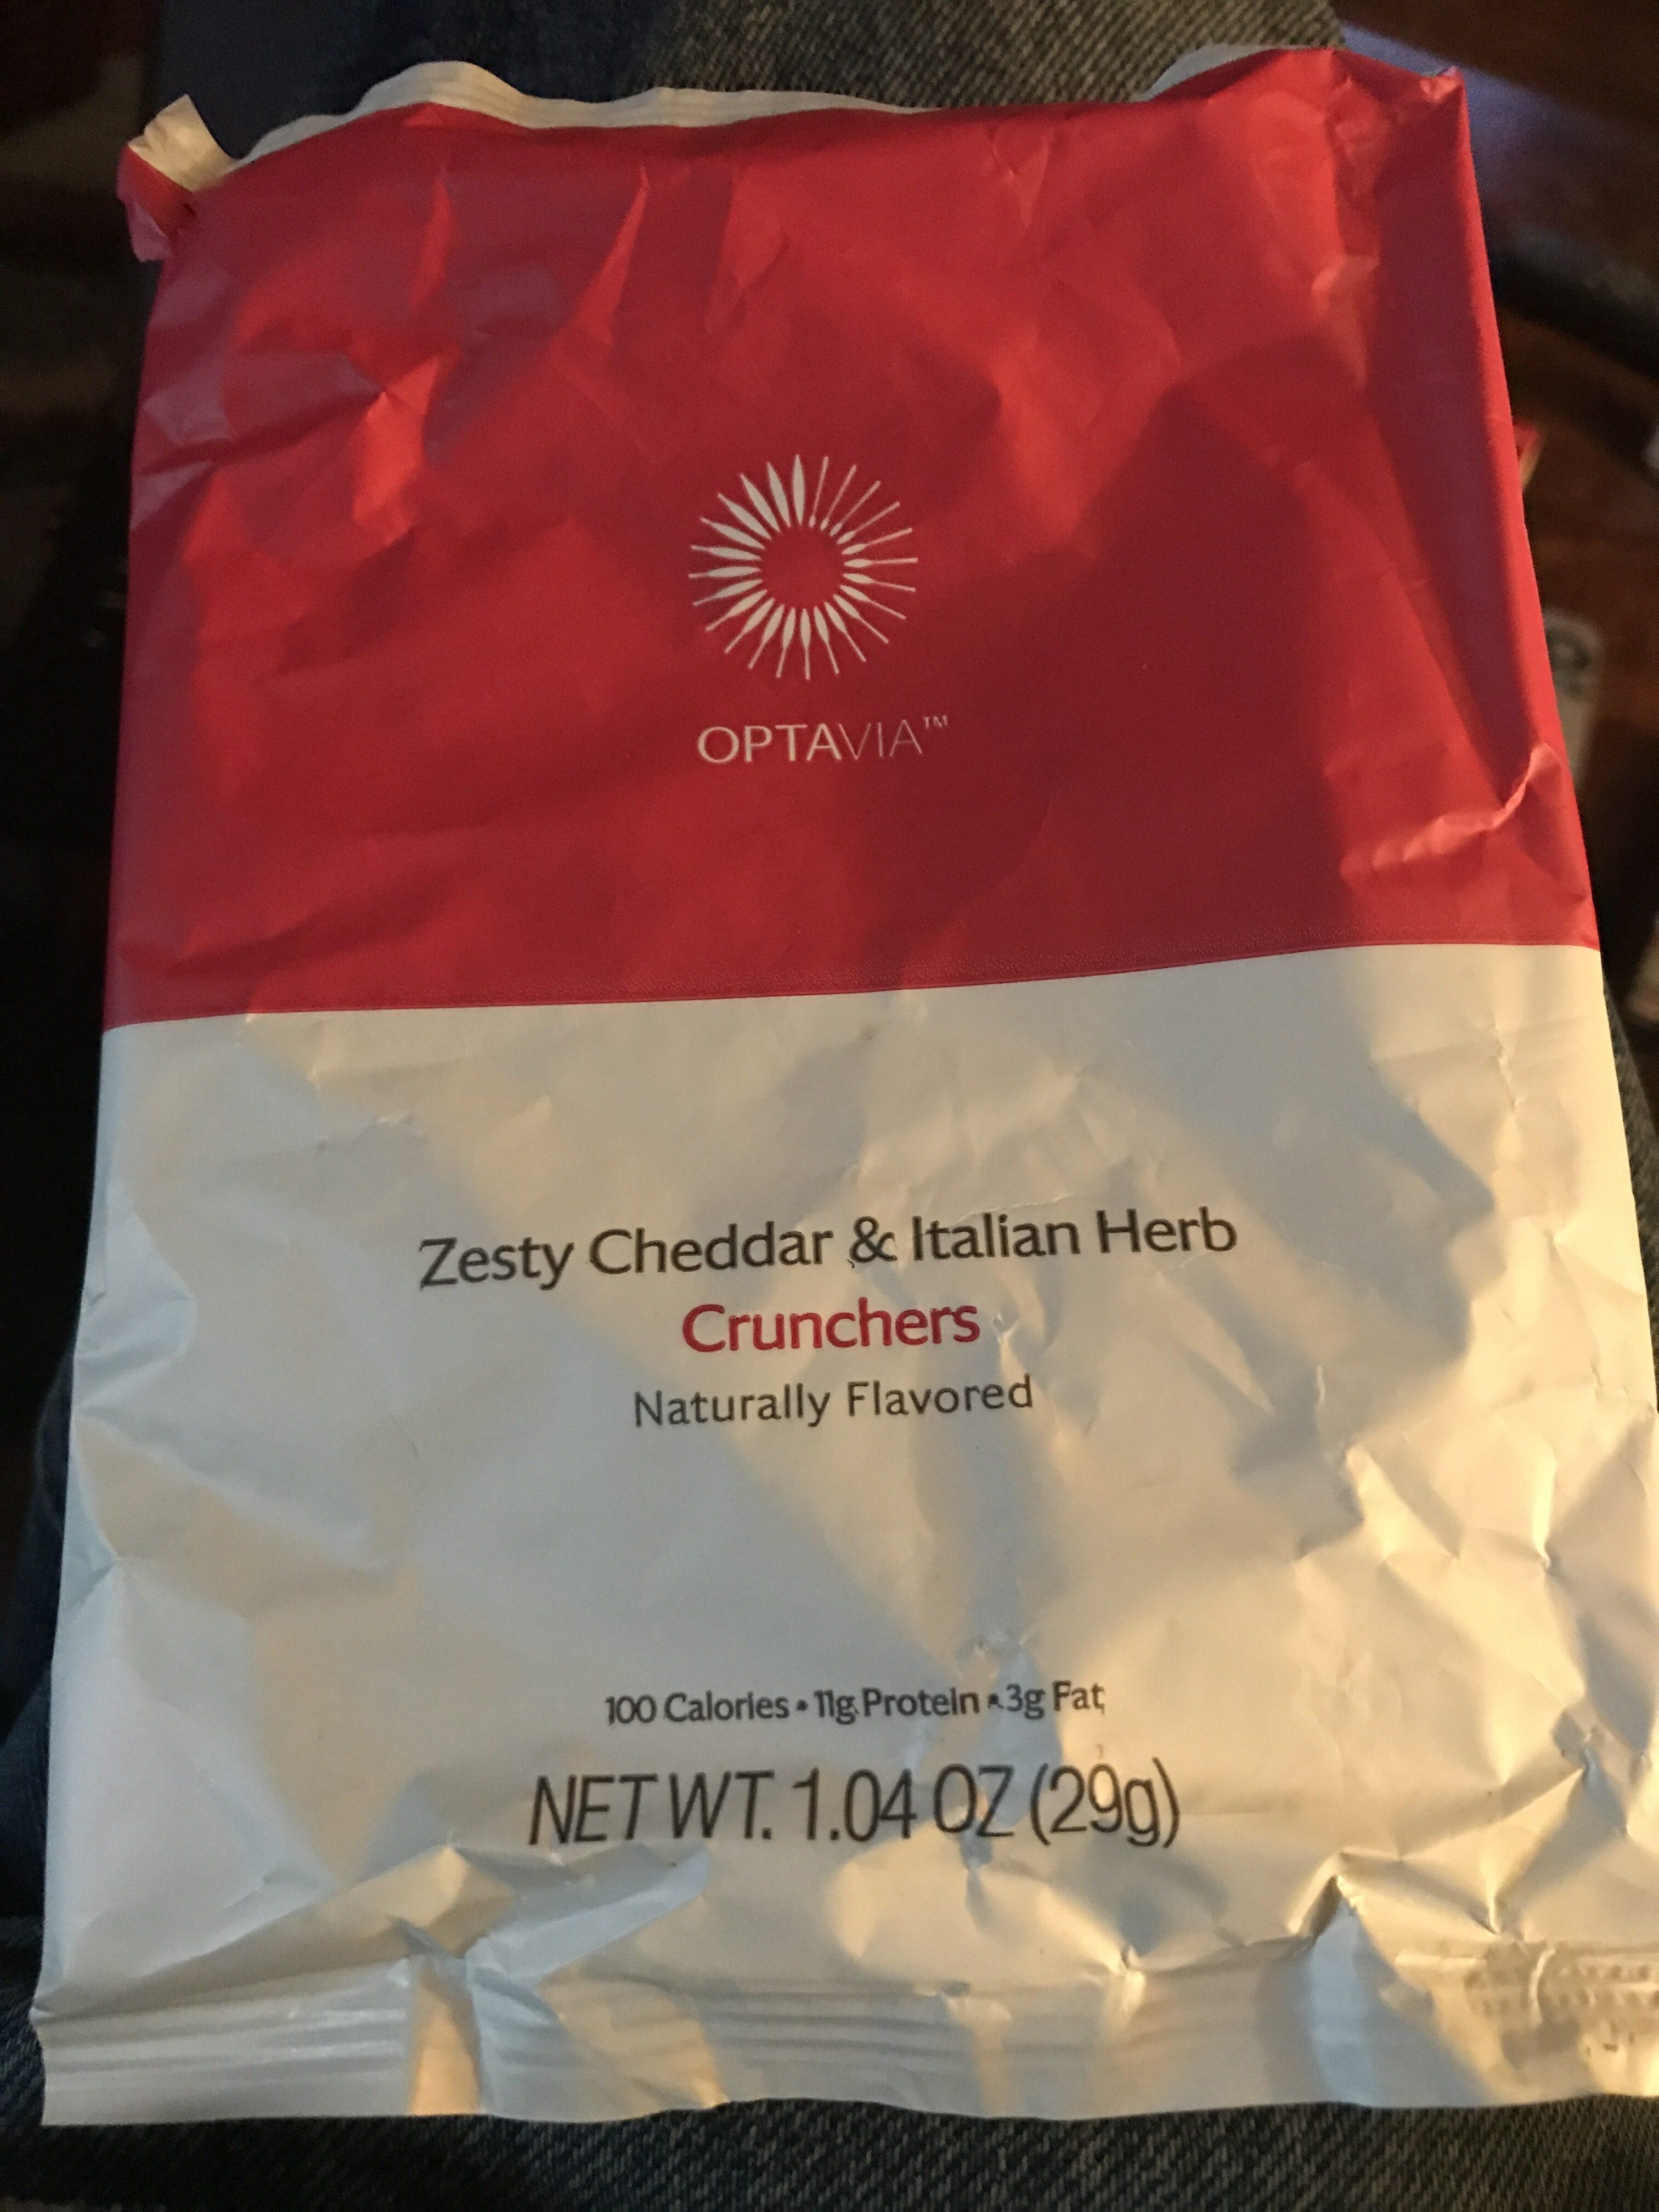 Zesty Cheddar & Italian Herb Crunchers - Product - en